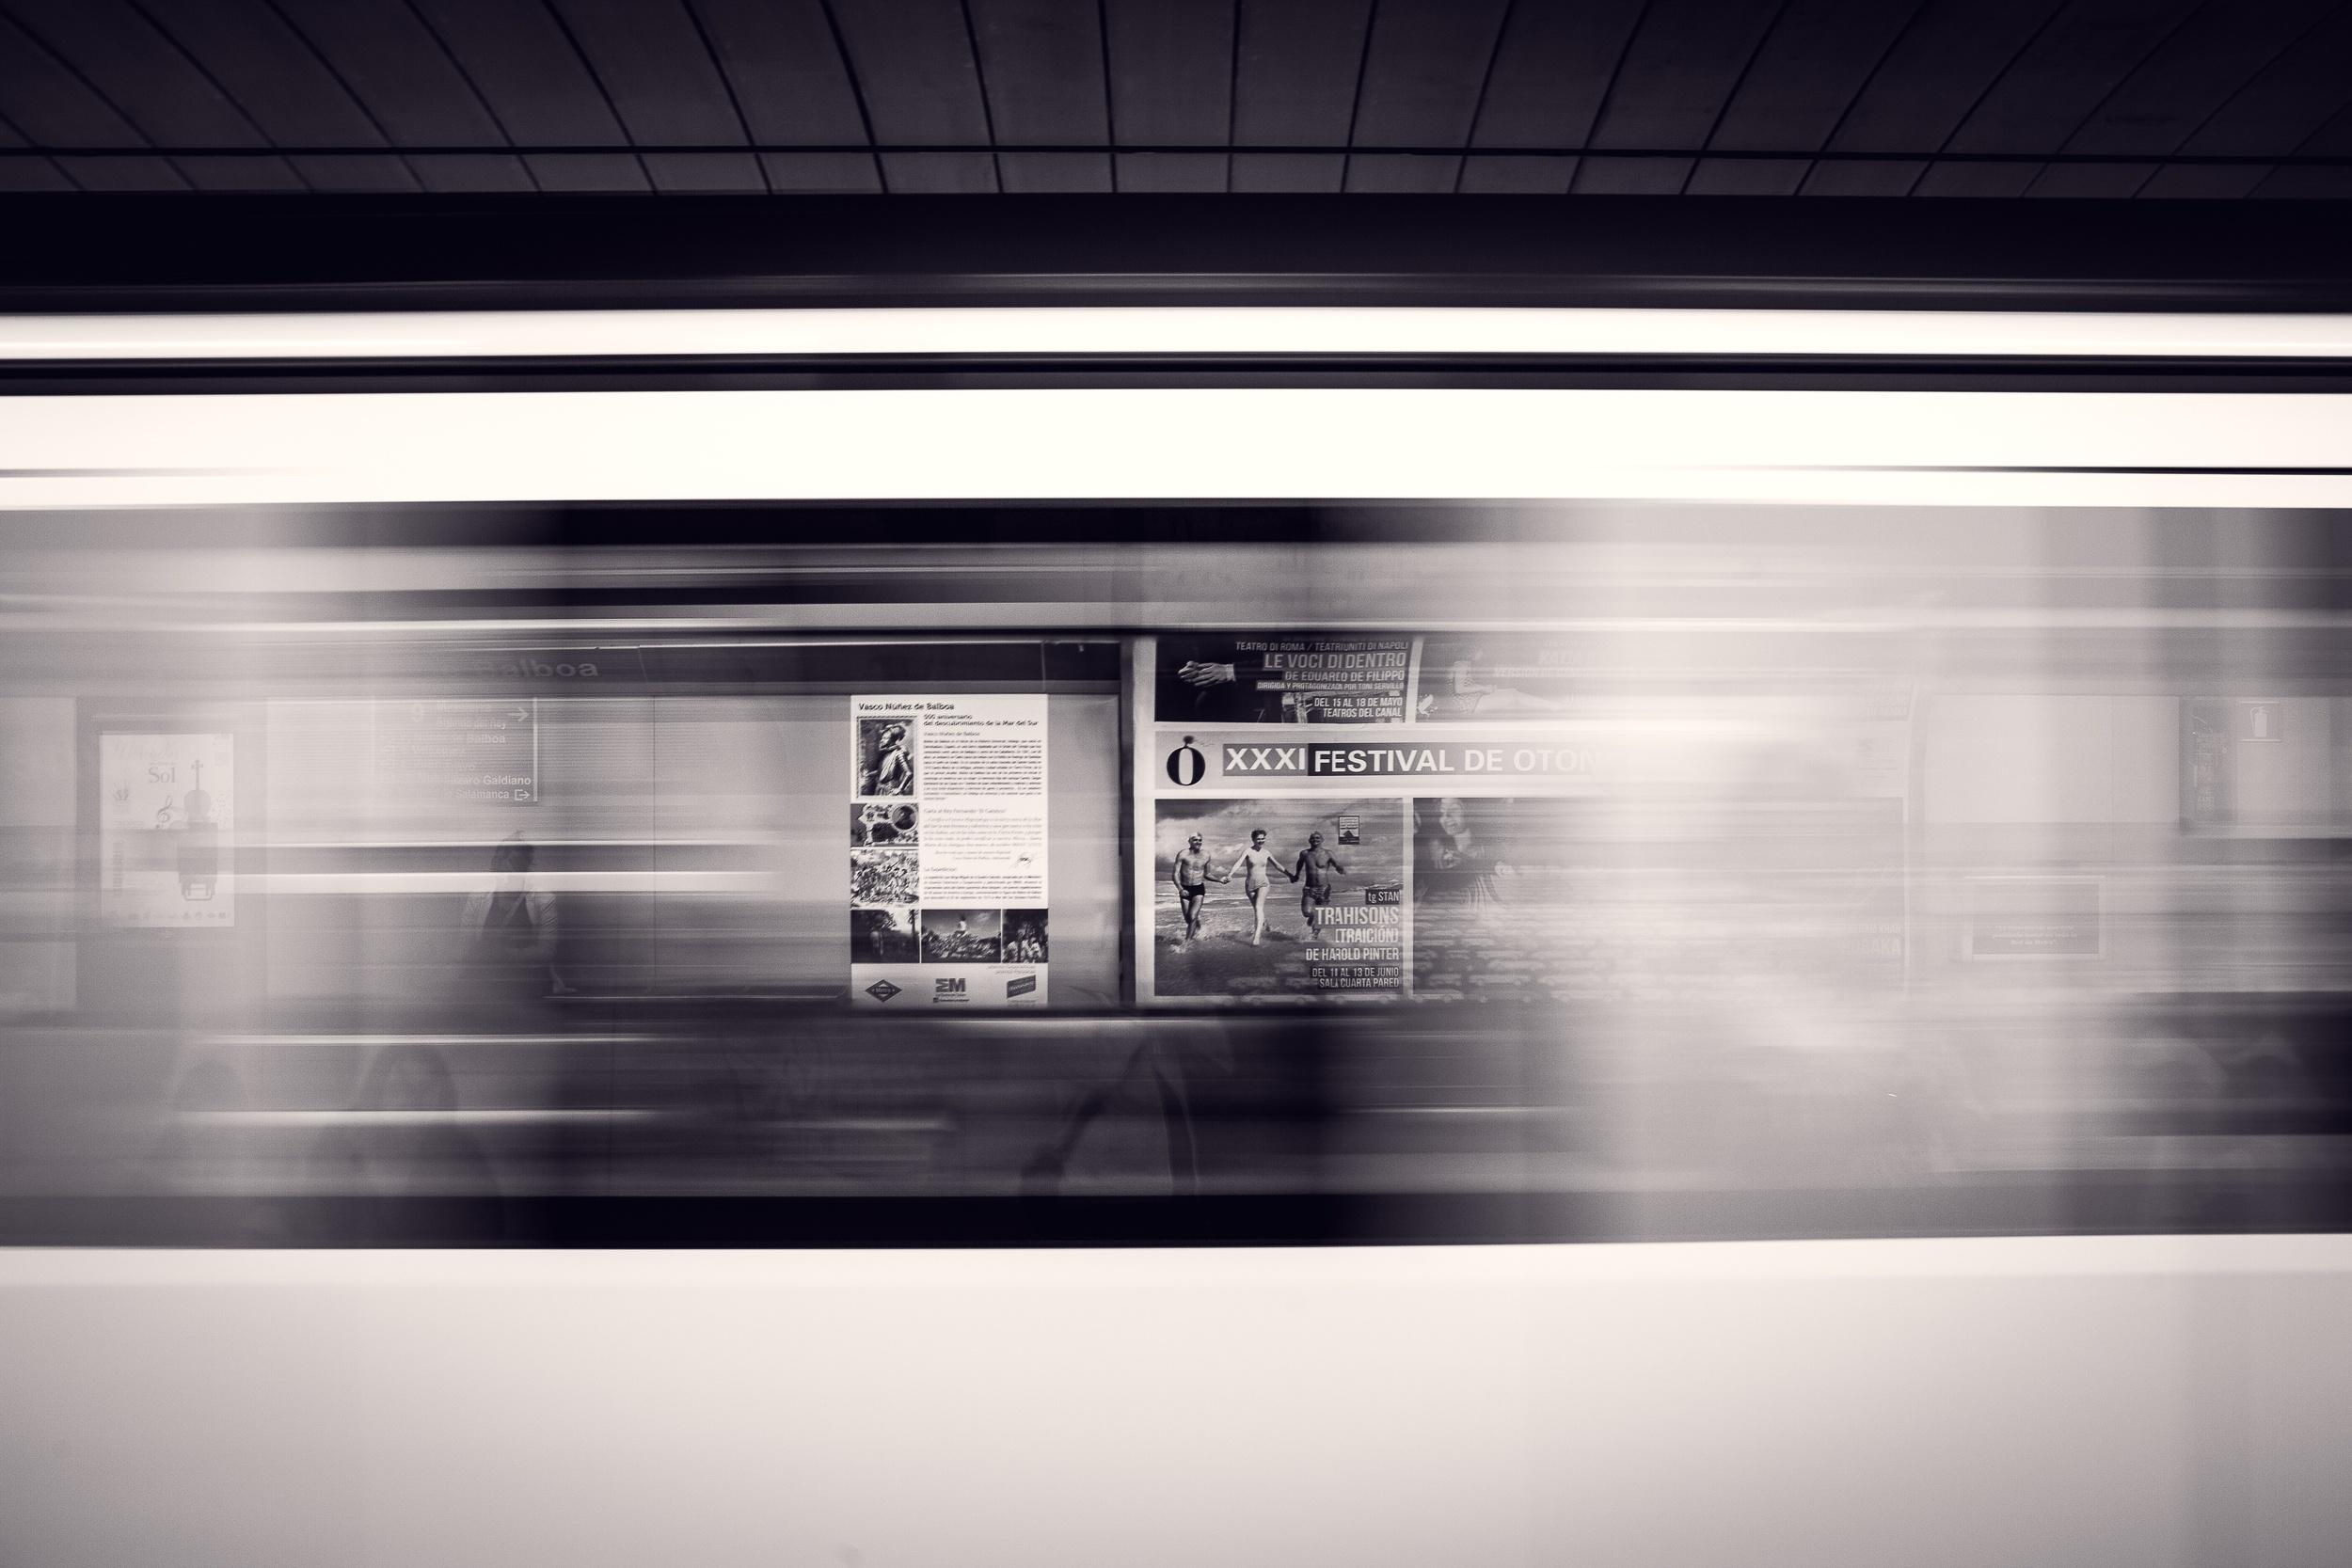 IMAGE CREDIT: Creative Commons -Mario Calvo via Unsplash